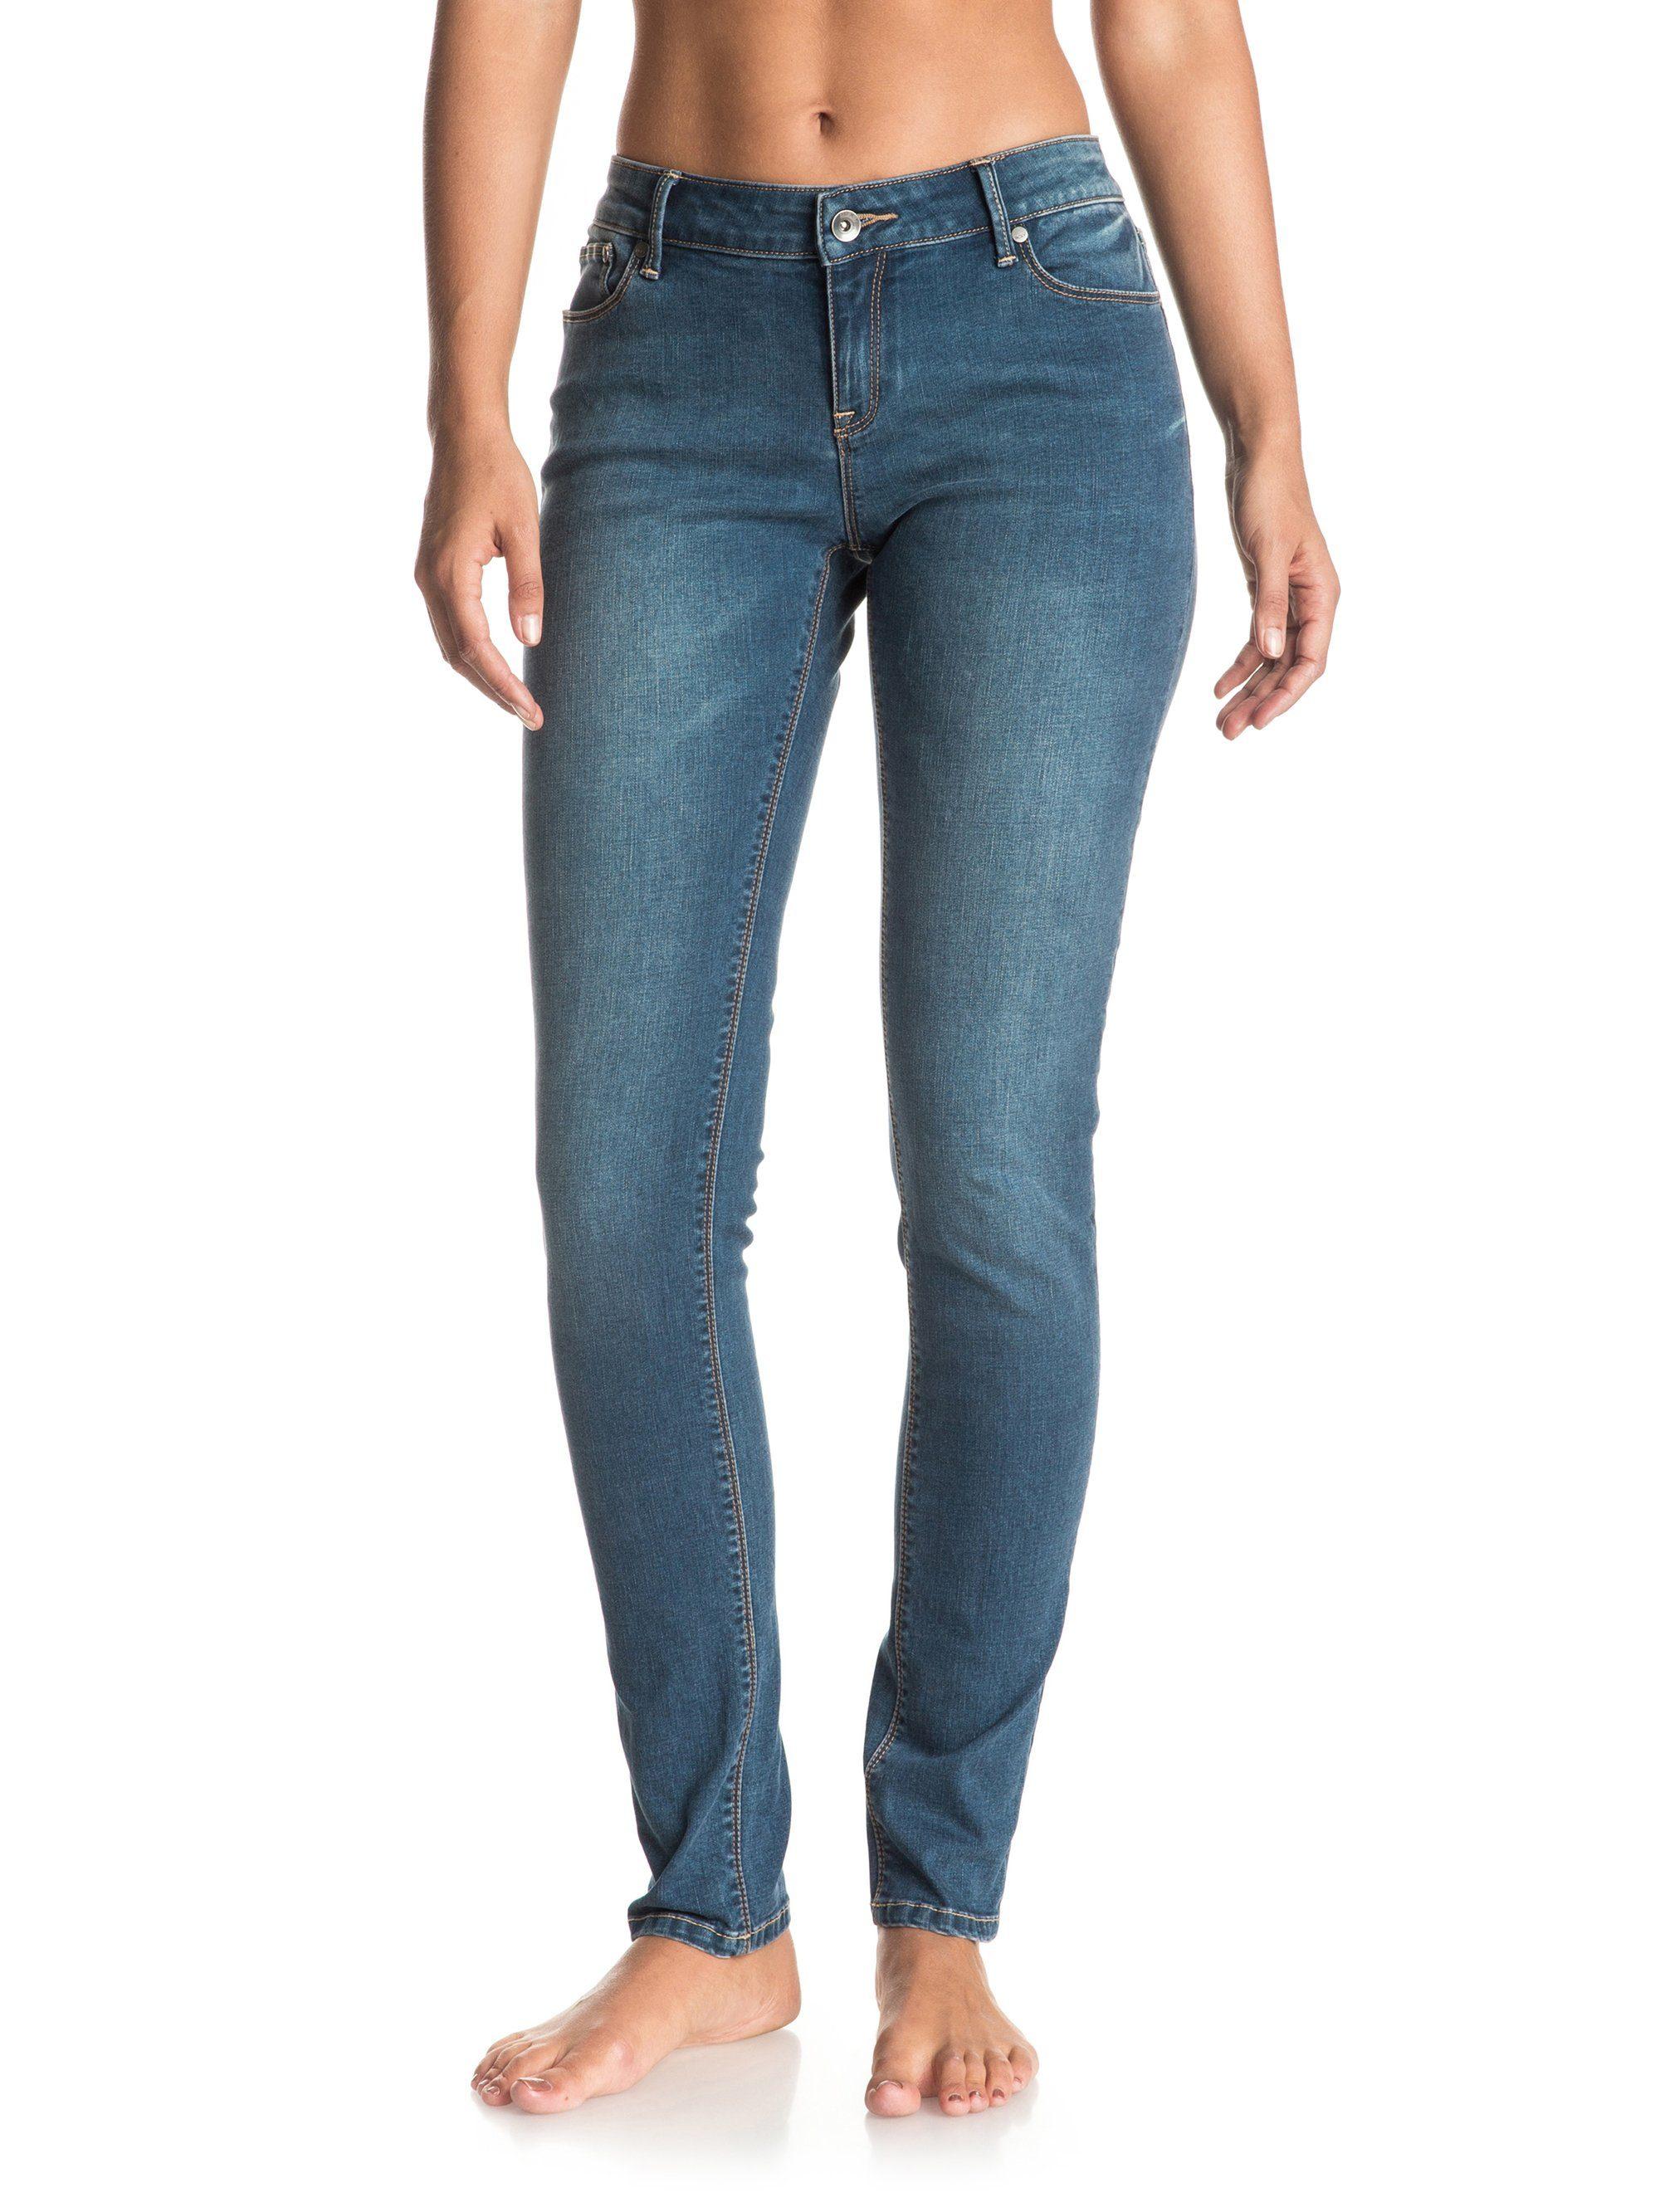 Suntrippers C Jeans dark blue Roxy B7bxru0